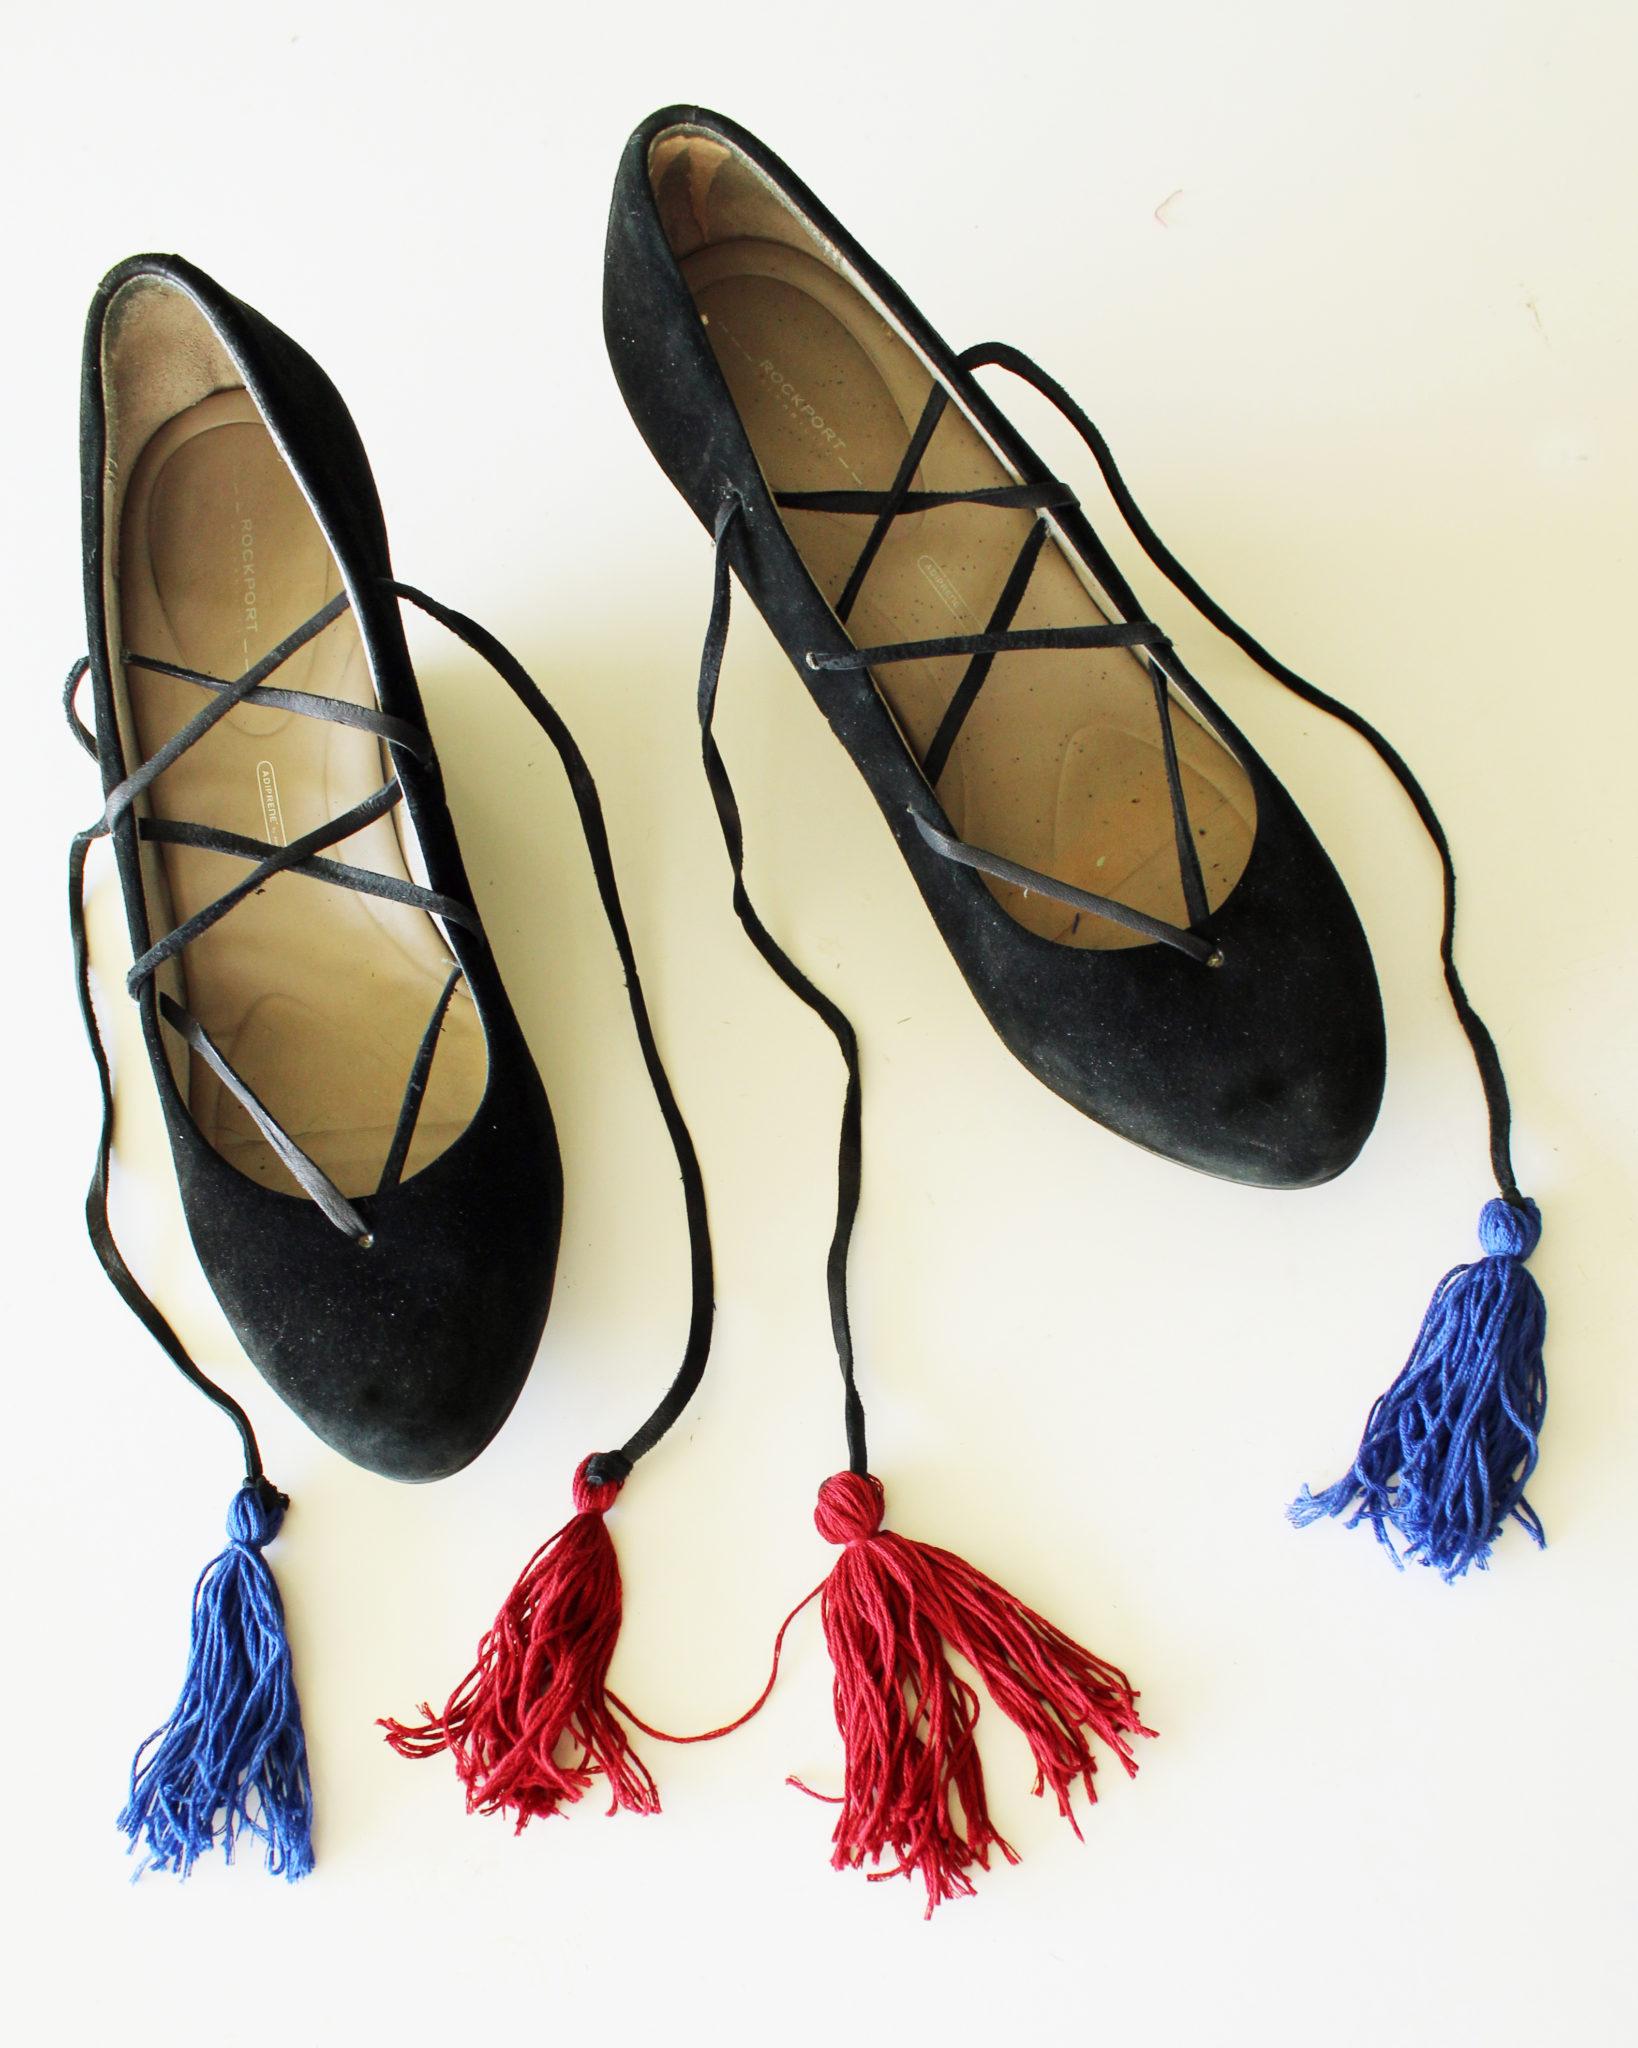 DIY Fashion Lace Up Boho Shoe Refashion Full Tutorial